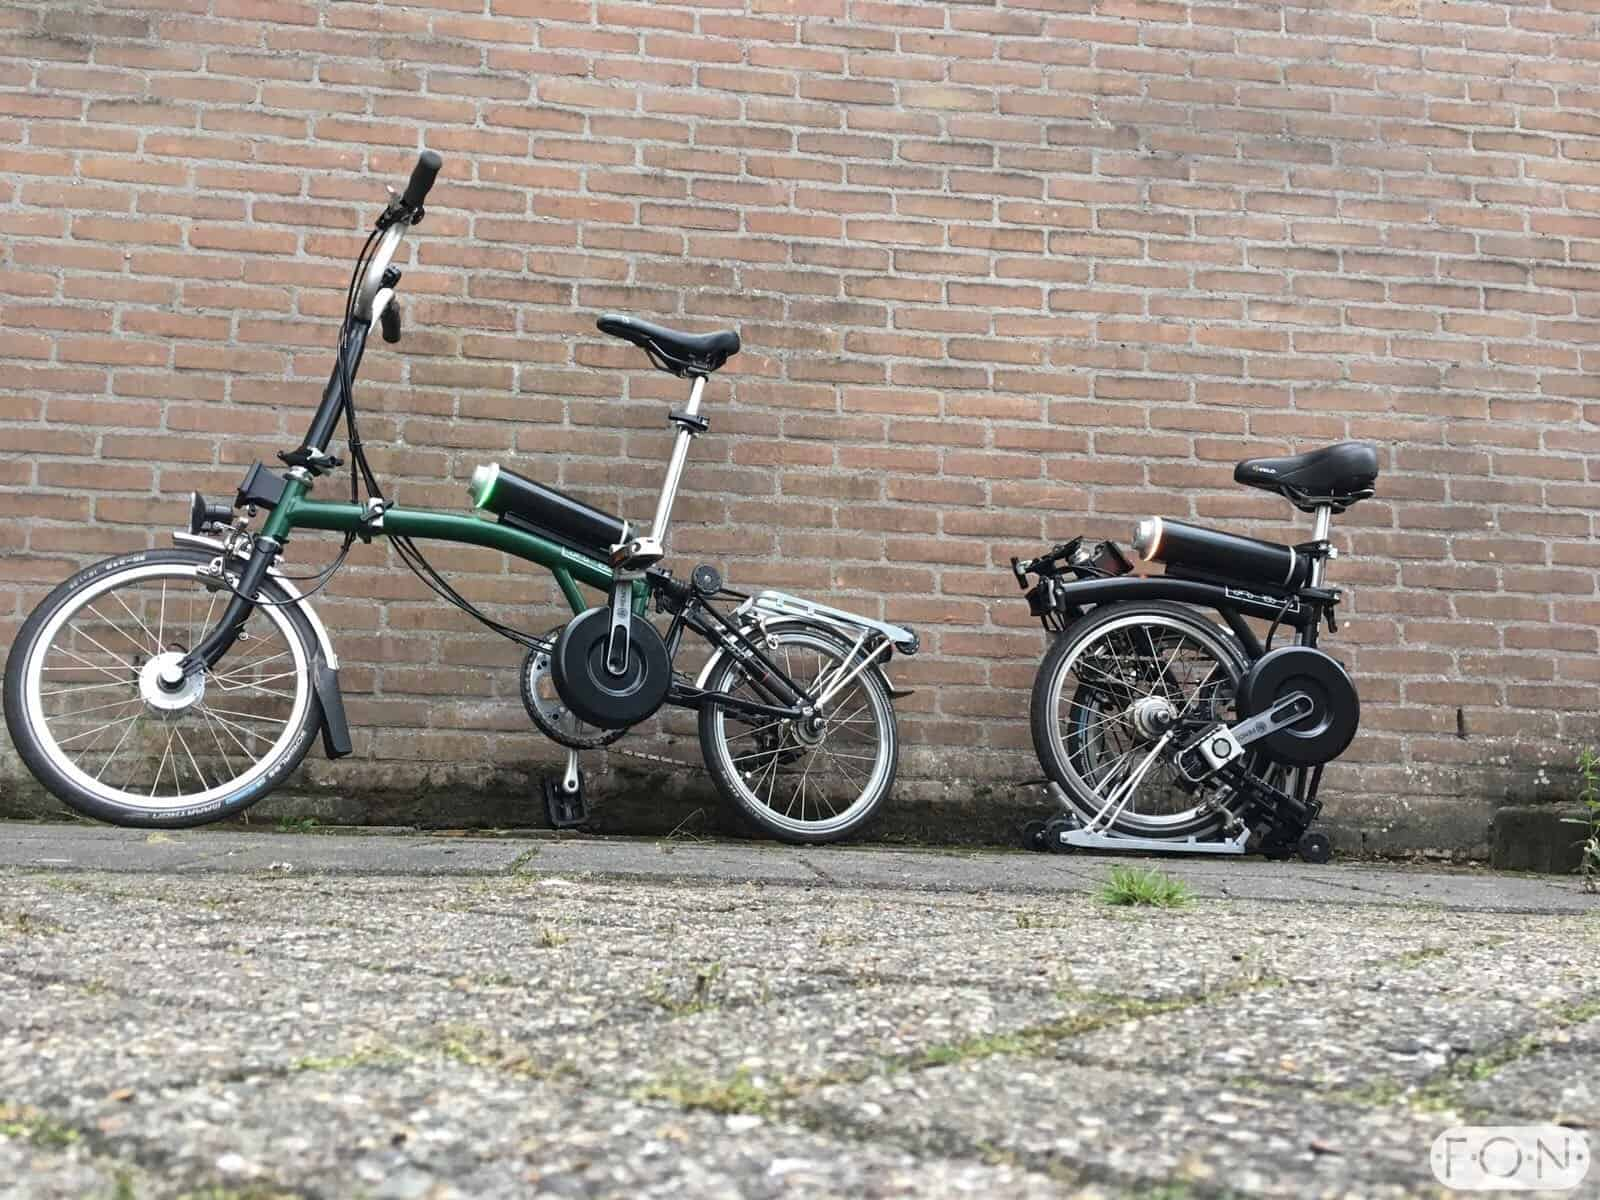 Brompton Vouwfiets Pendix eDrive Middenmotor FONebike Arnhem 0016